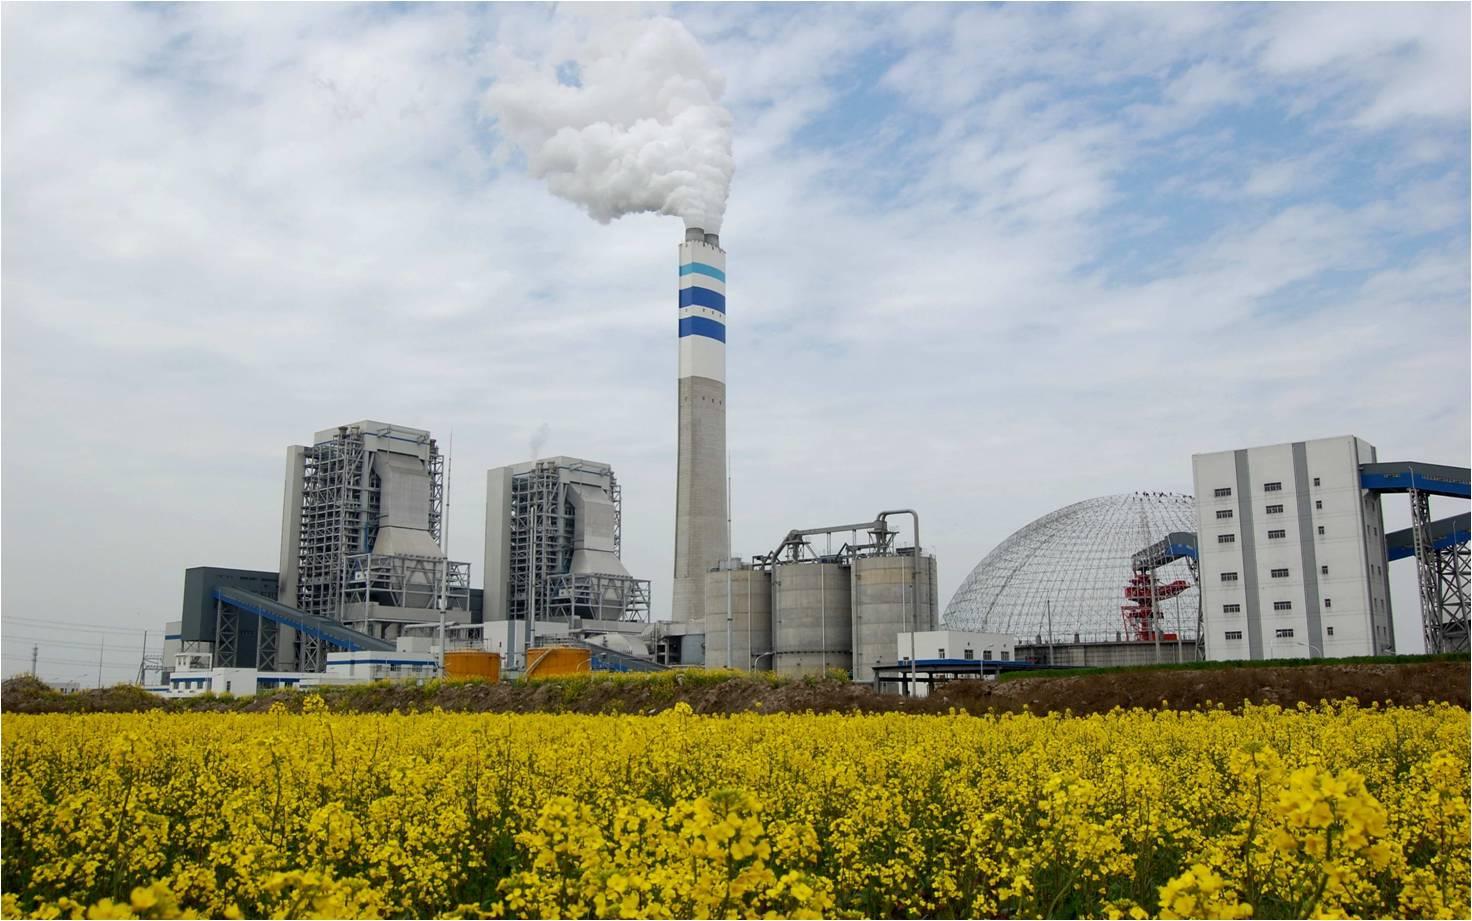 Shanghai Electric Power Plant